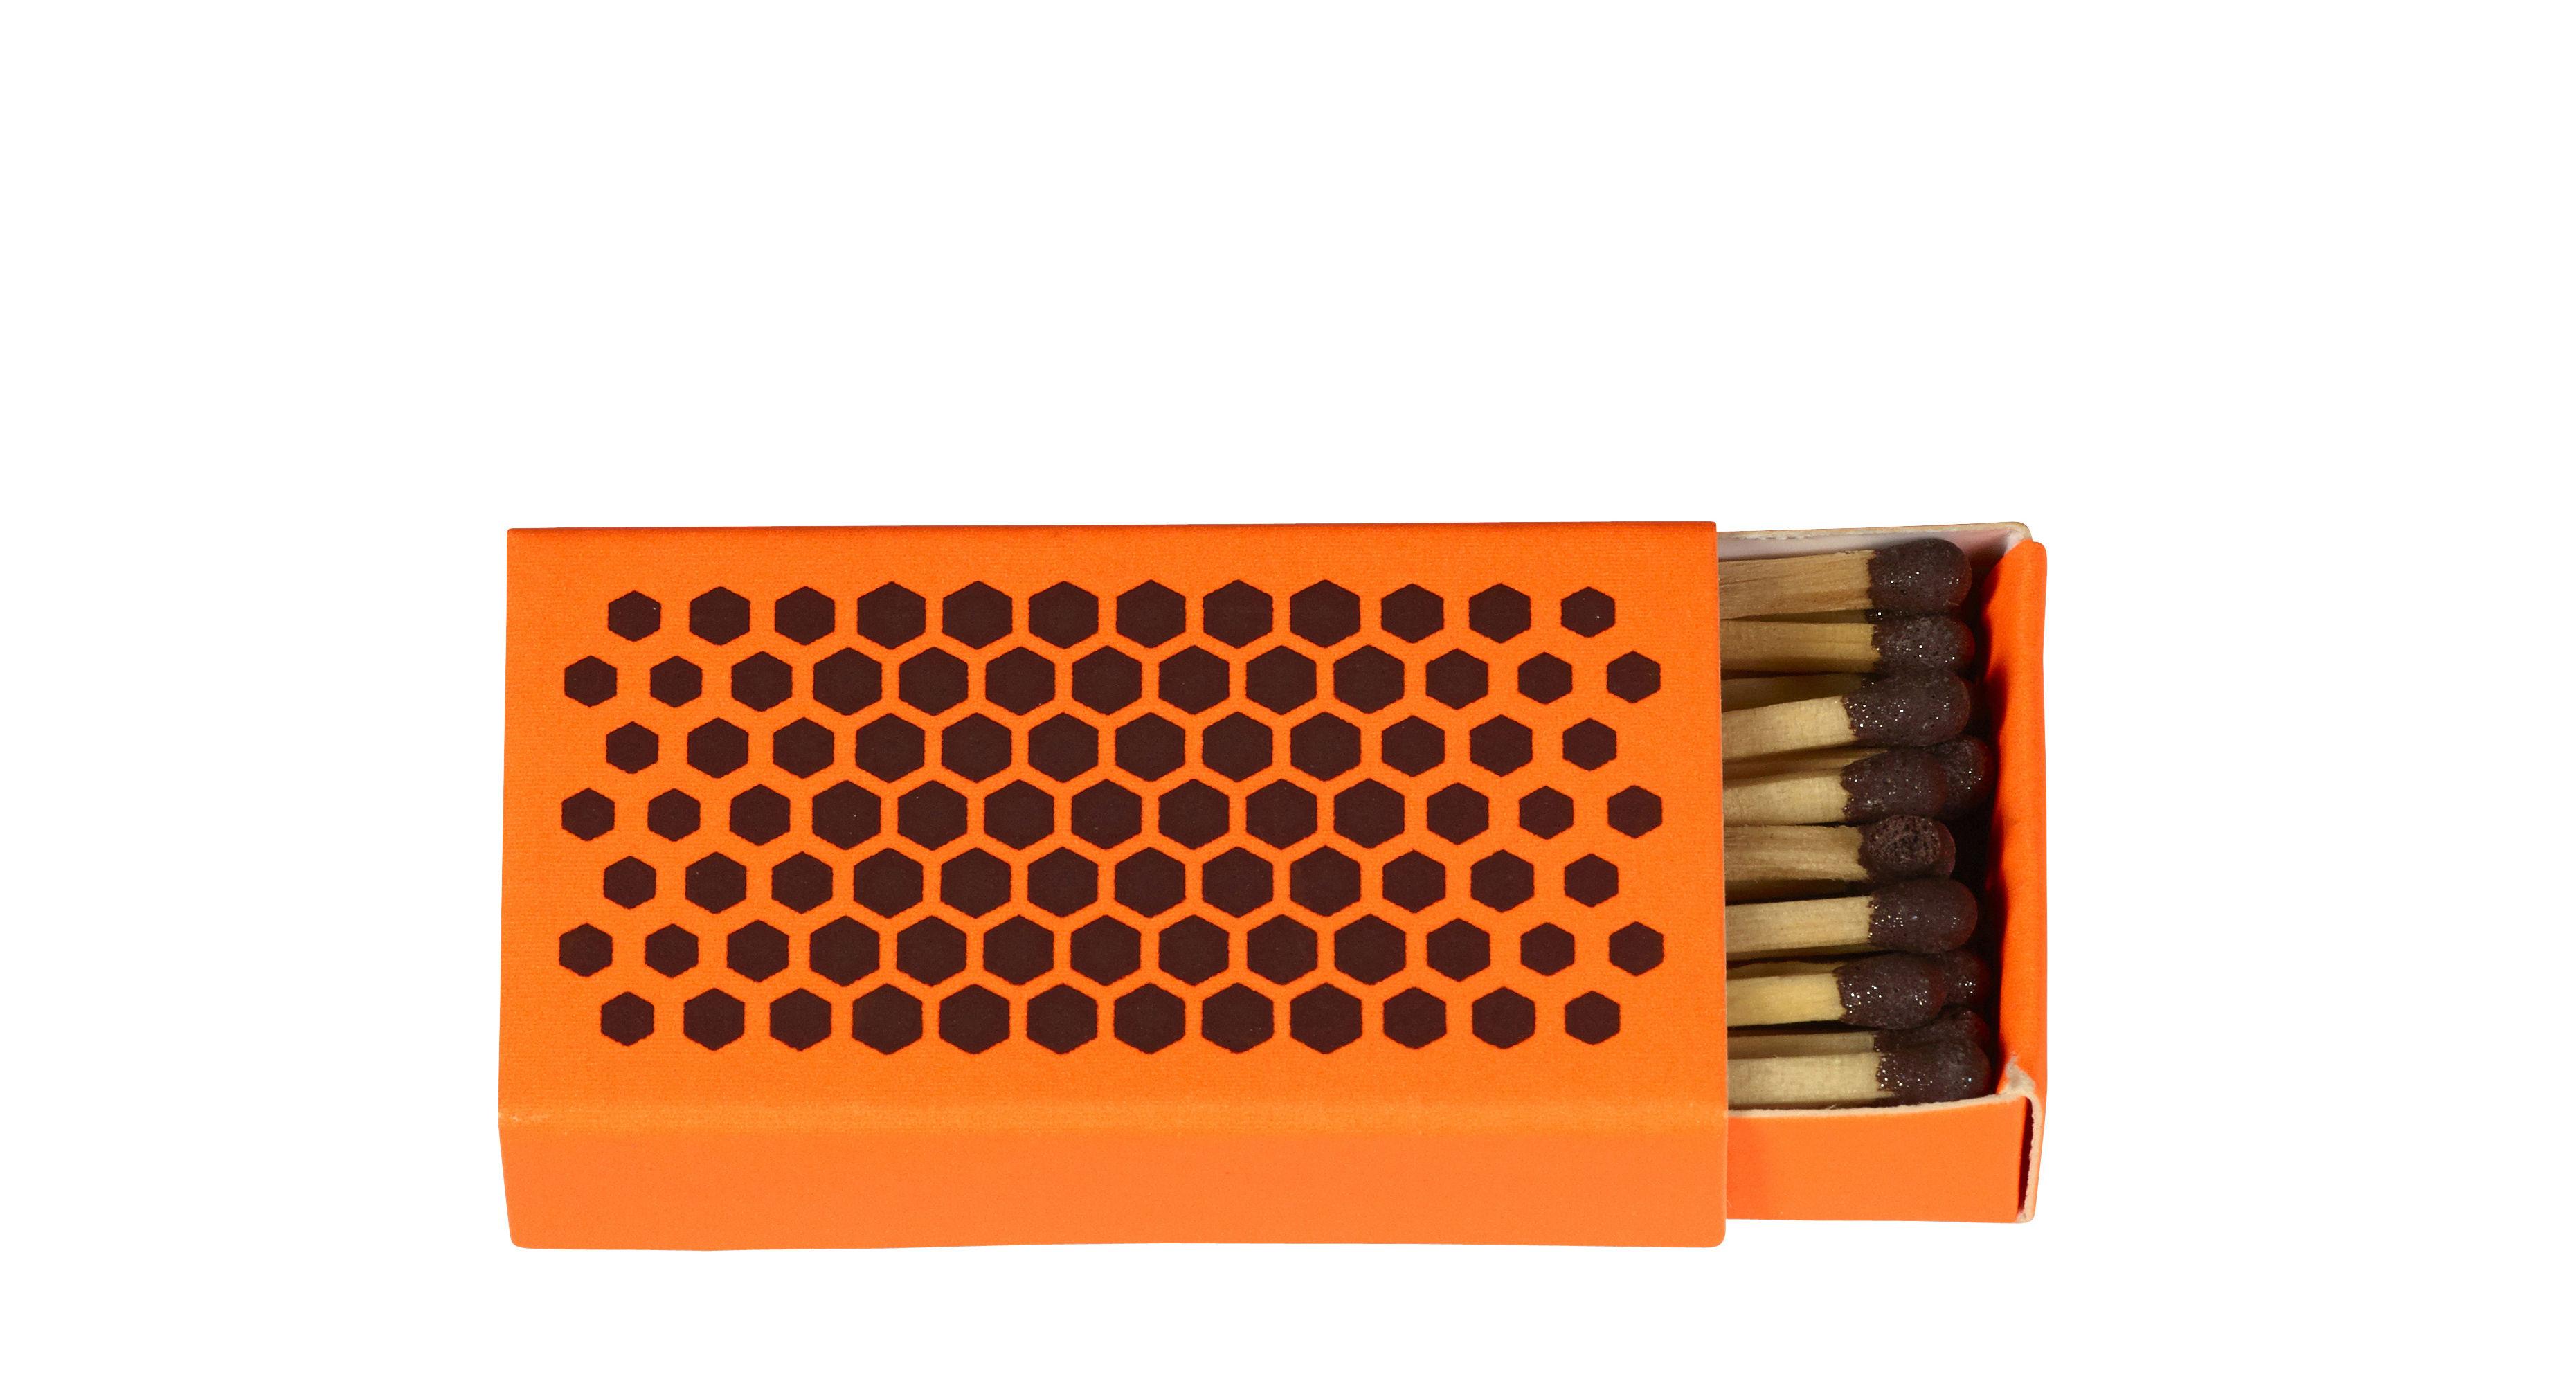 Ventes Flash - Grande Vente de Noël - Boîte d'allumettes Strike / 6 x 3 cm - Hay - Orange / 6 x 3 cm - Bois, Carton